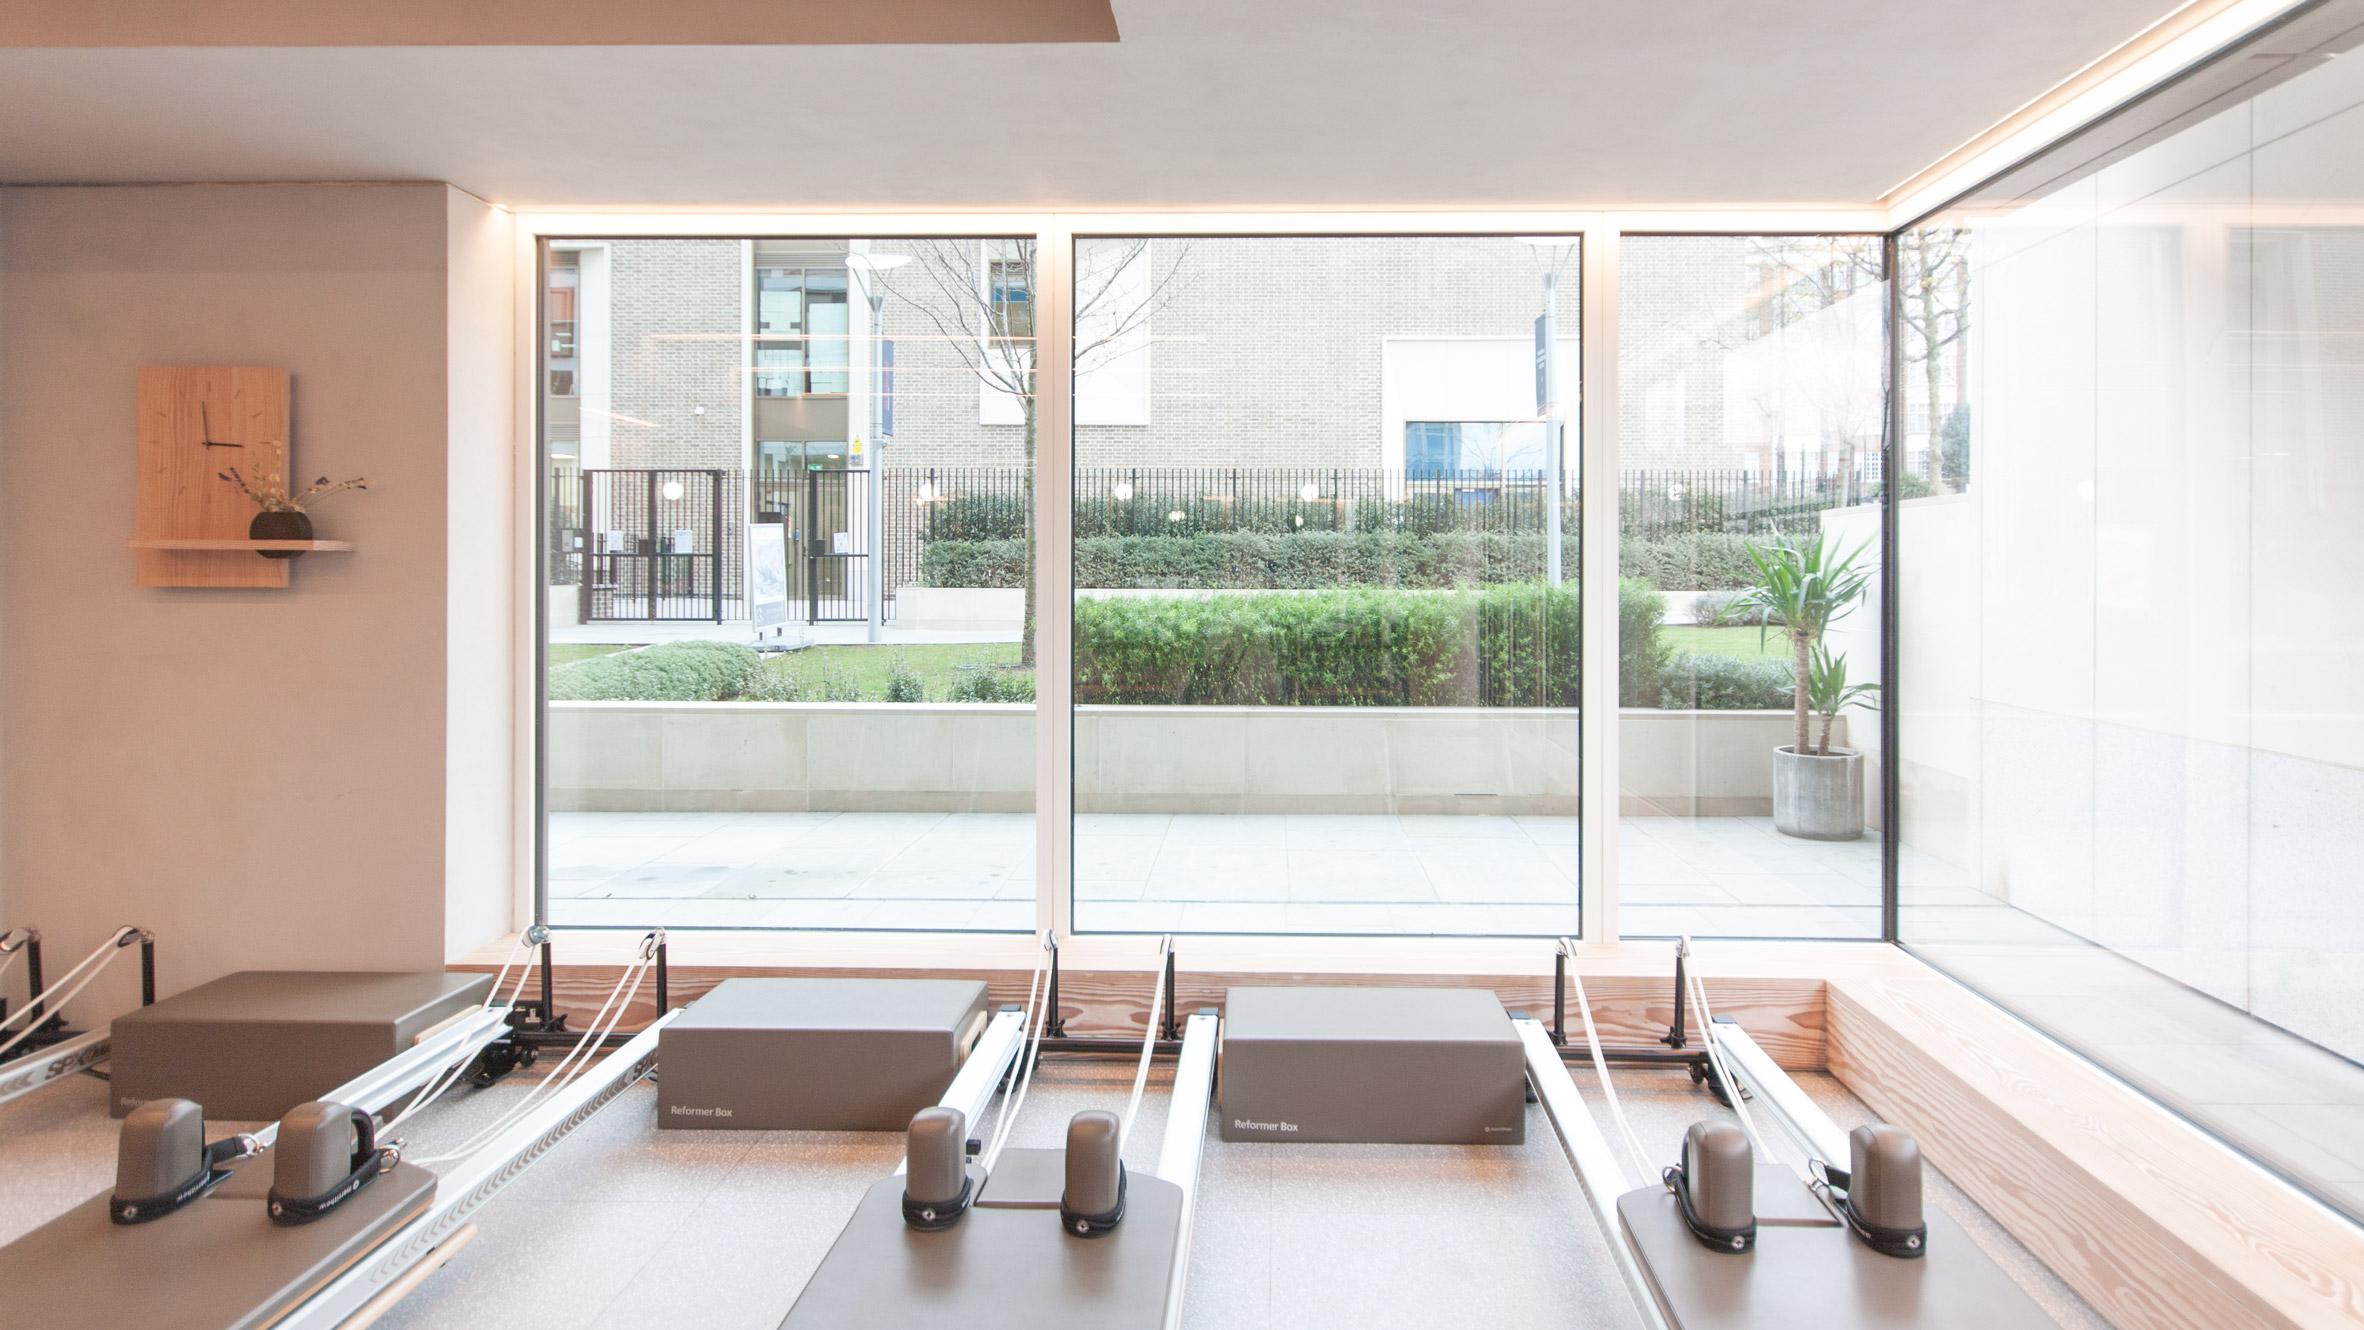 Core Kensington Pilates Studio Blends Mexican And Norwegian Design